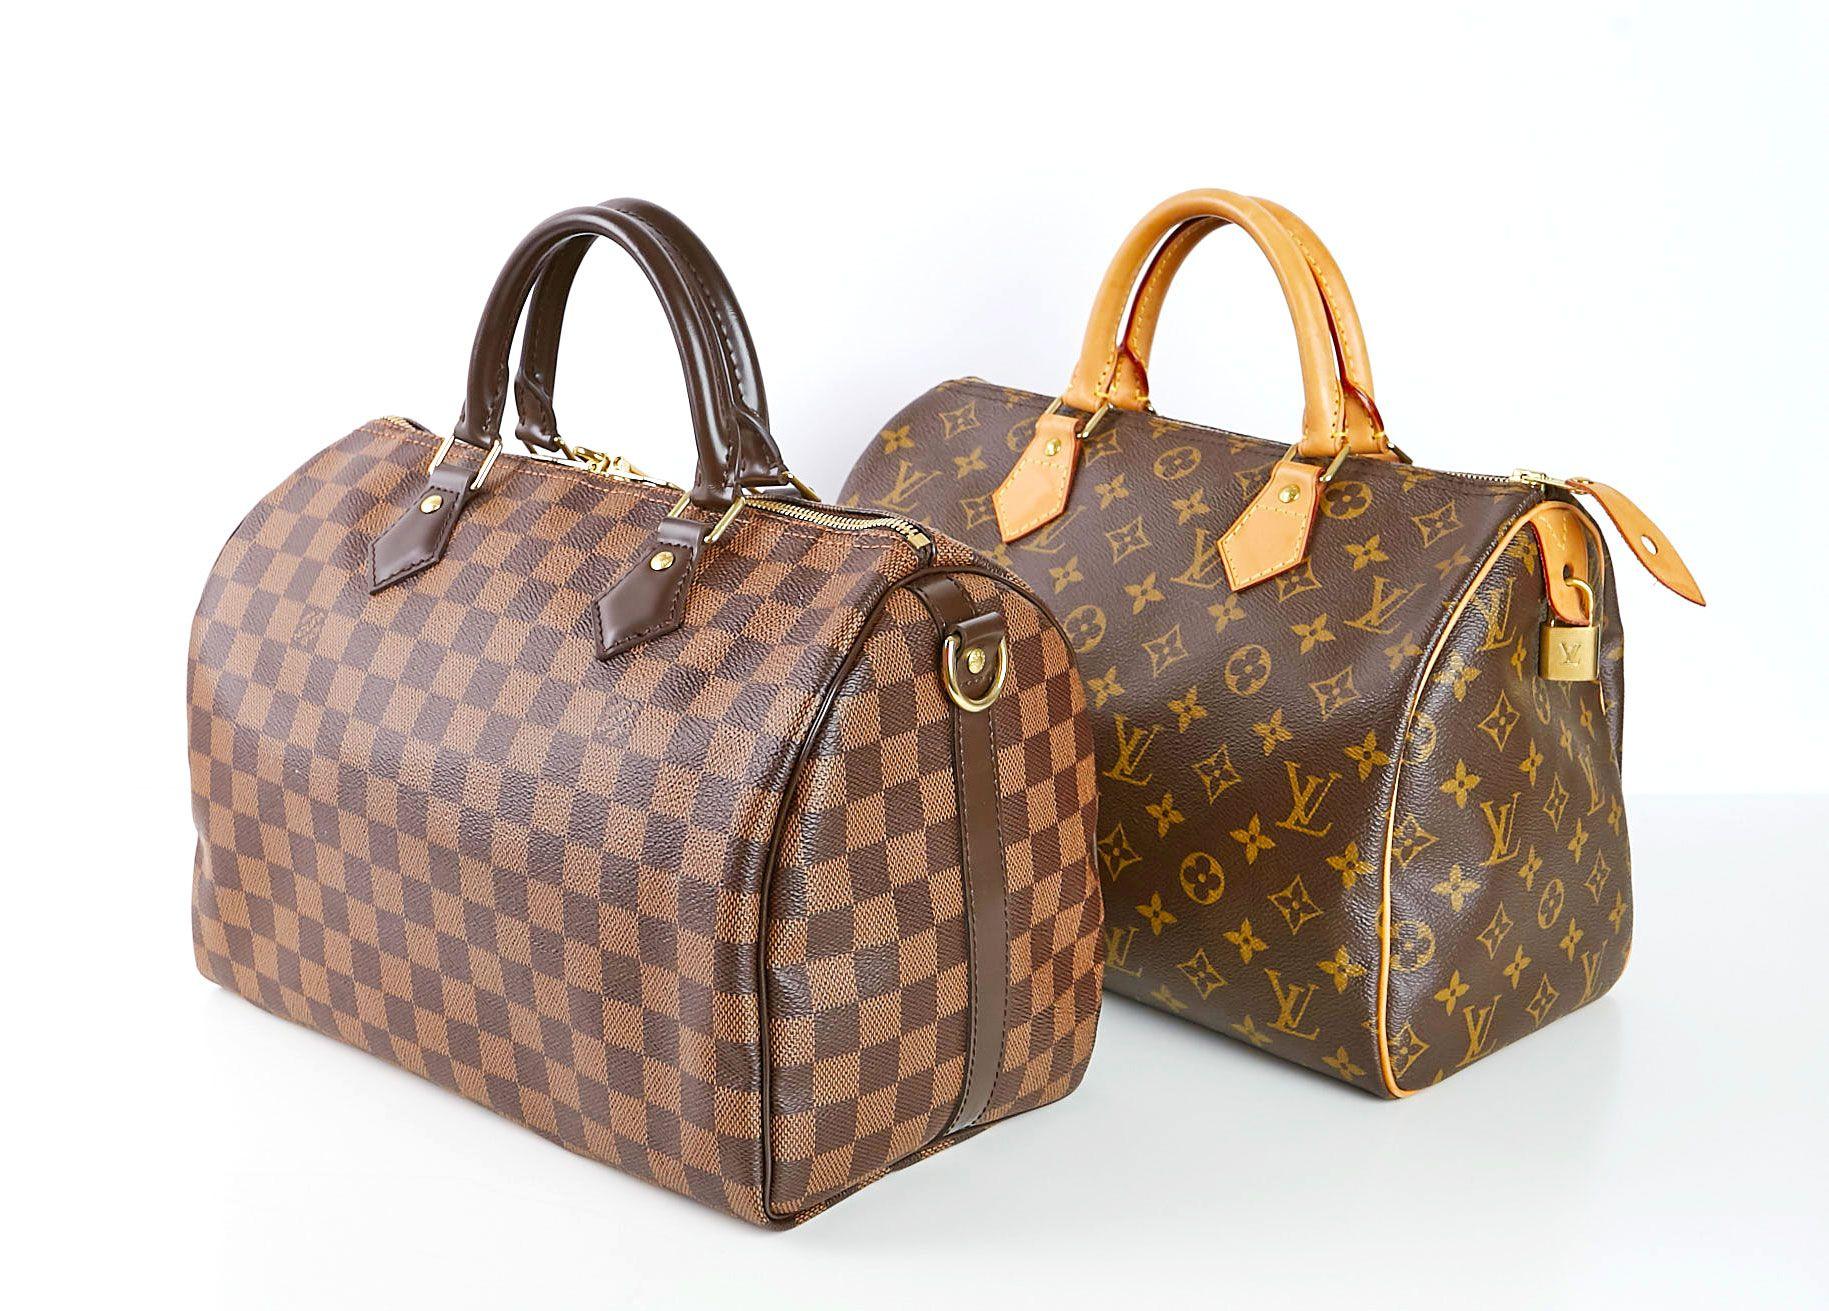 Are Louis Vuitton Bags Made In Usa Yoogis Closet Blog >> Louis Vuitton Damier Ebene Speedy Bandouliere 30 And Louis Vuitton